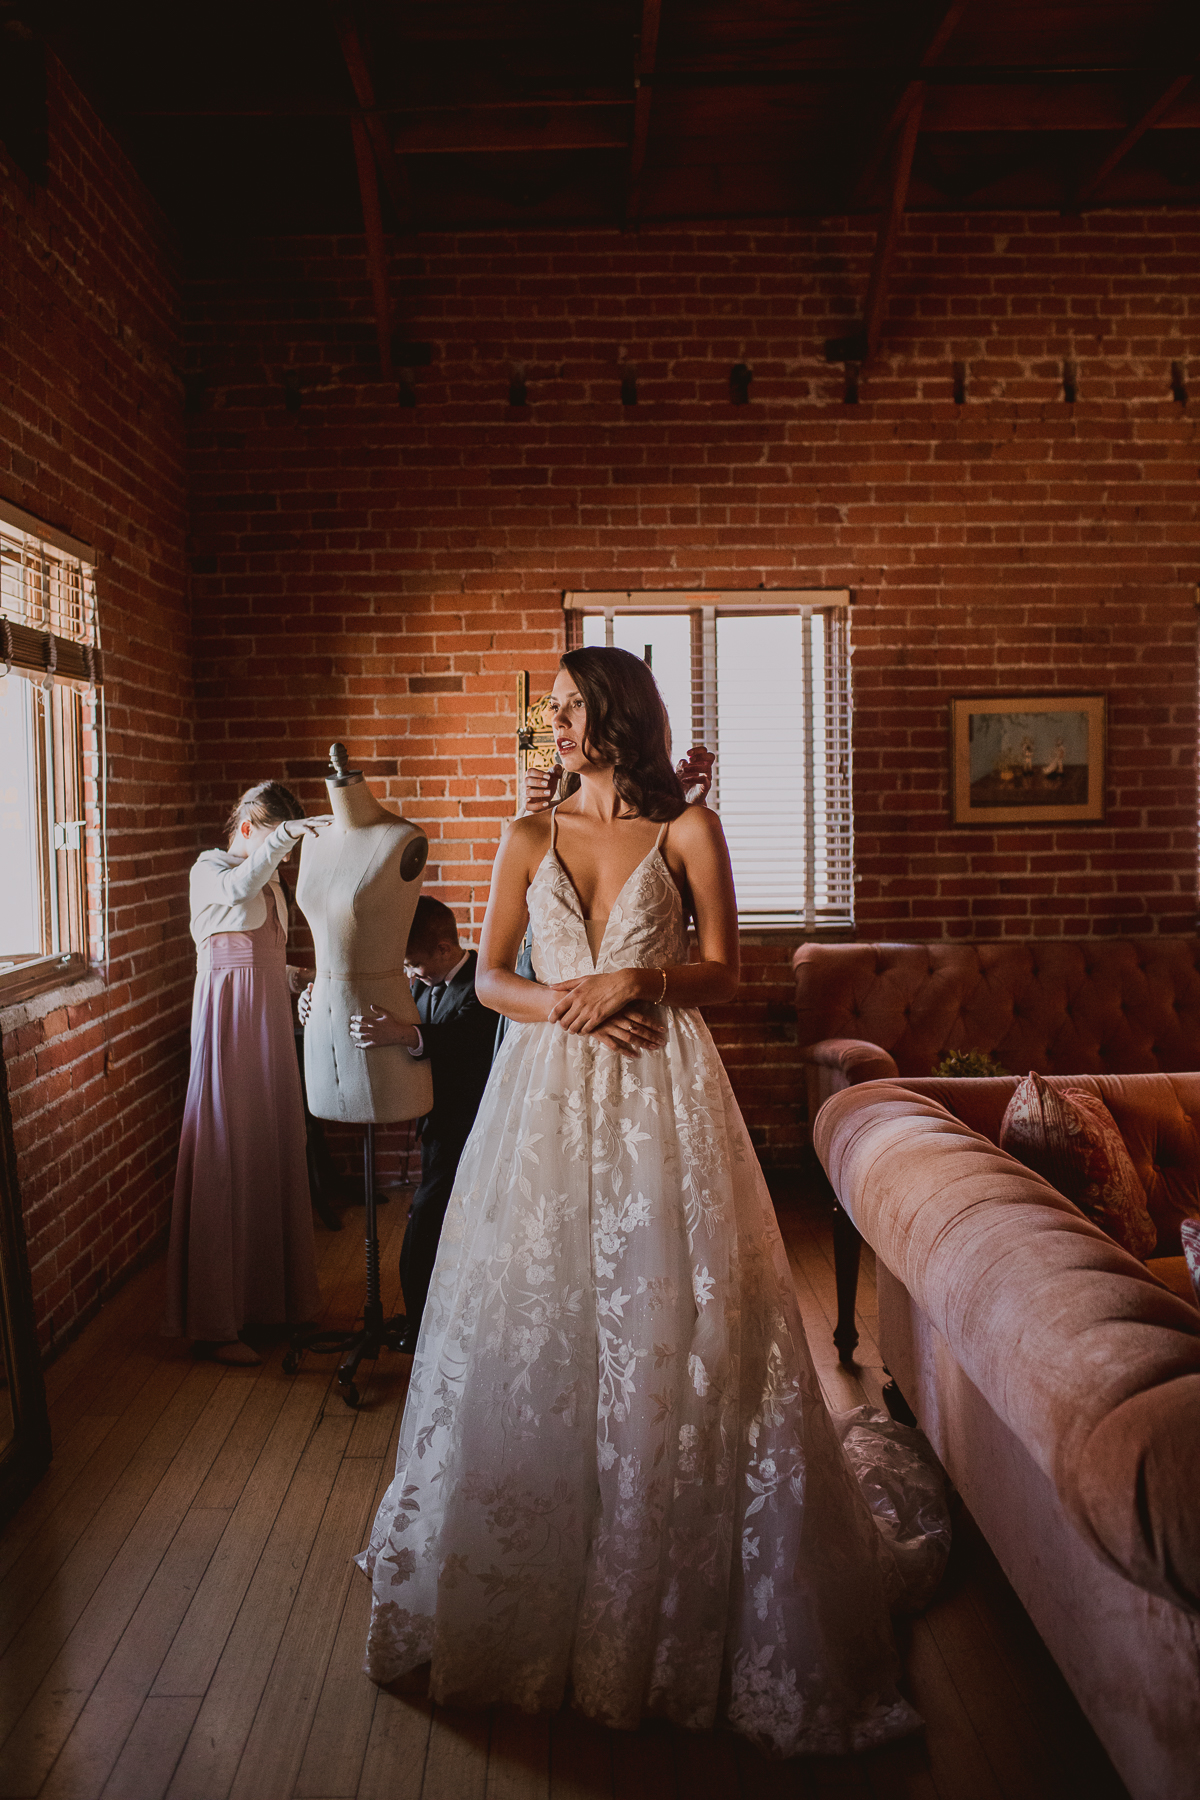 carondelet-house-kelley-raye-los-angeles-wedding-photographer-17.jpg